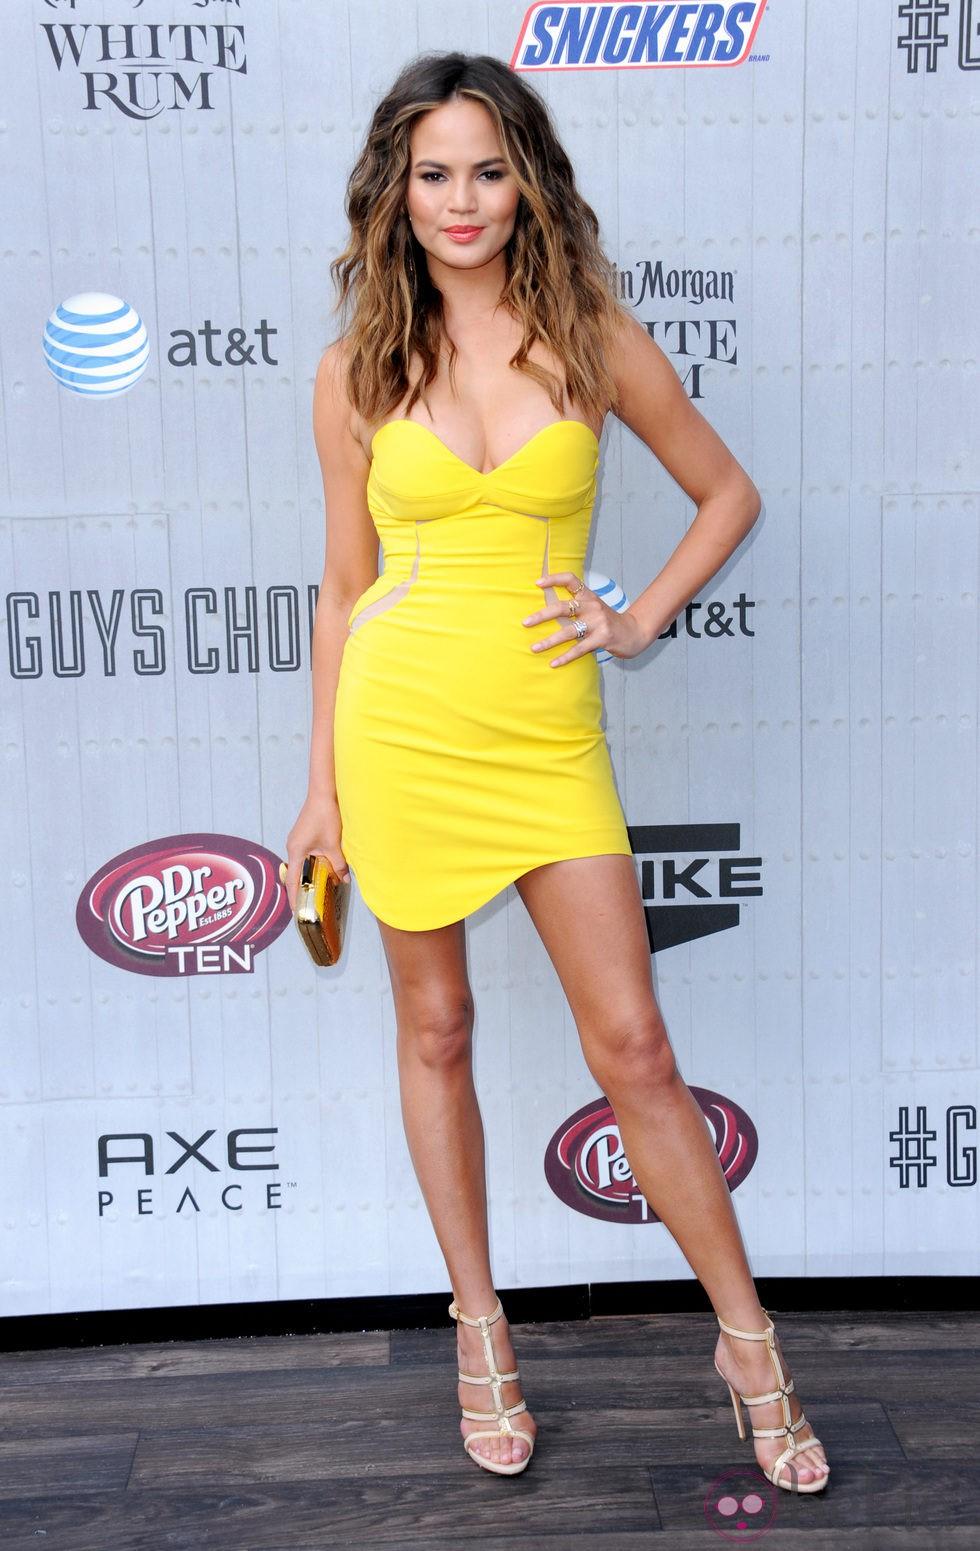 Chrissy Teigen en los premios Guys Choice 2014